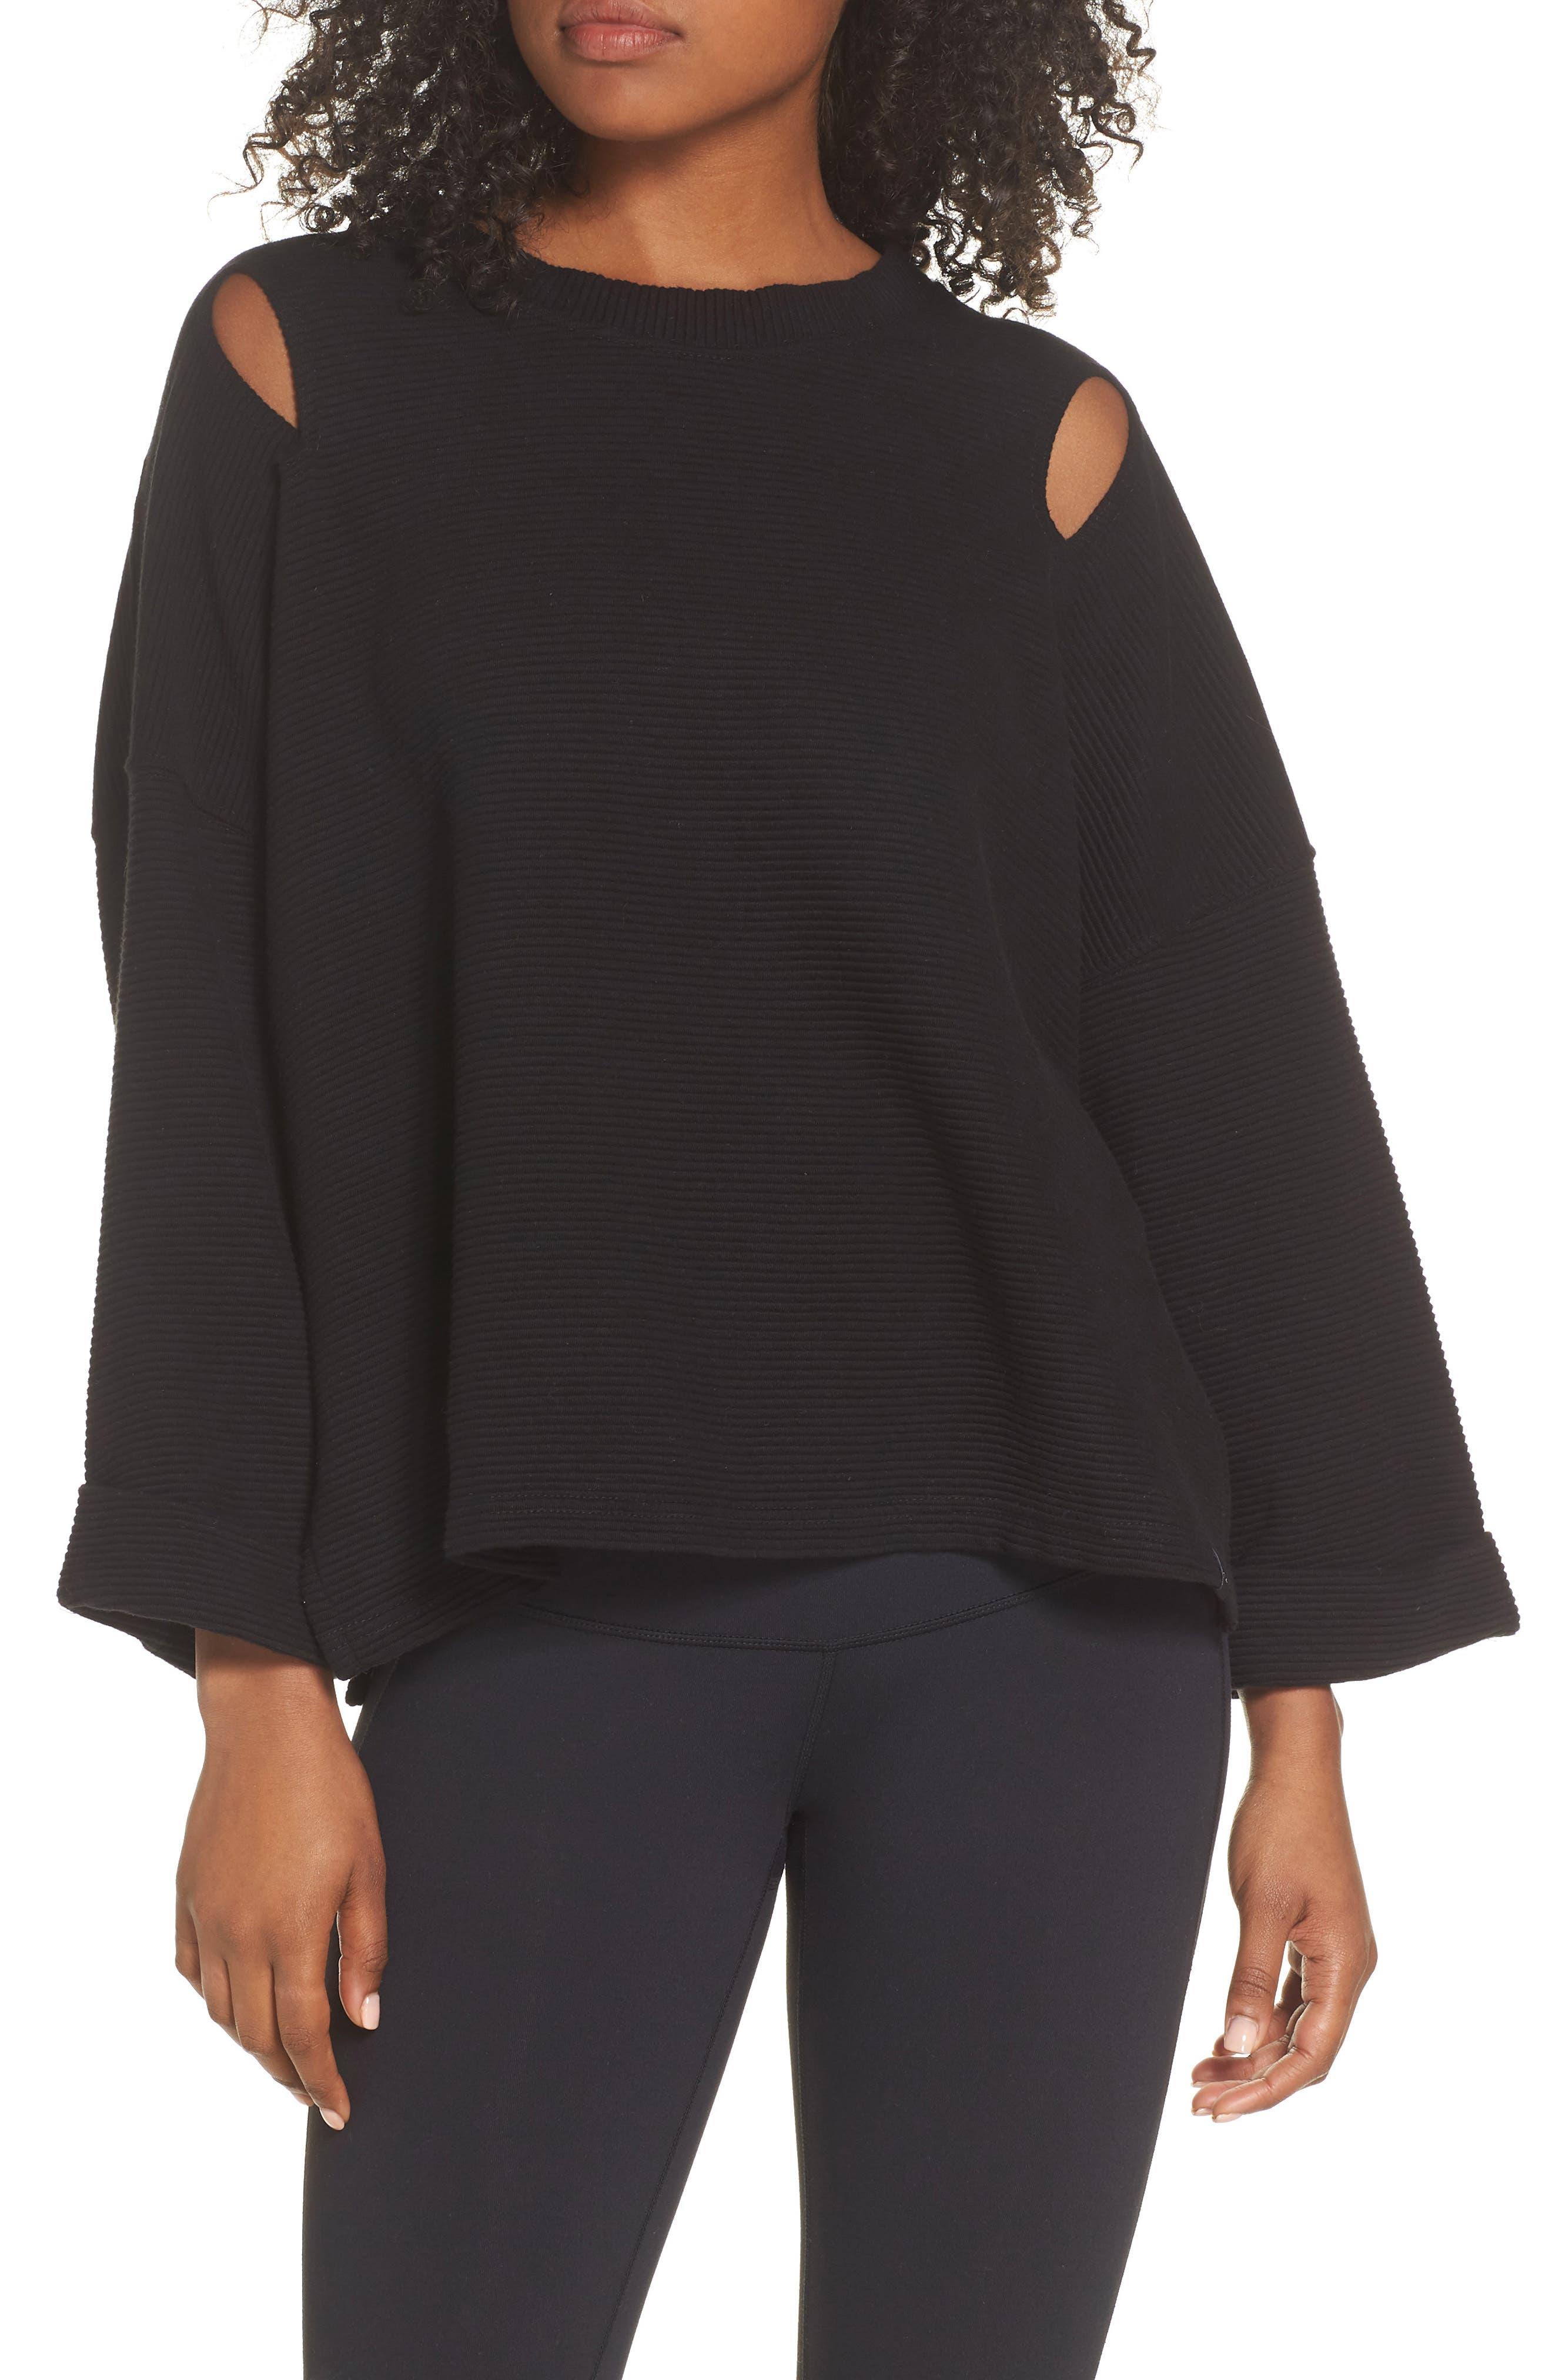 Jenny Sweatshirt,                         Main,                         color, BLACK